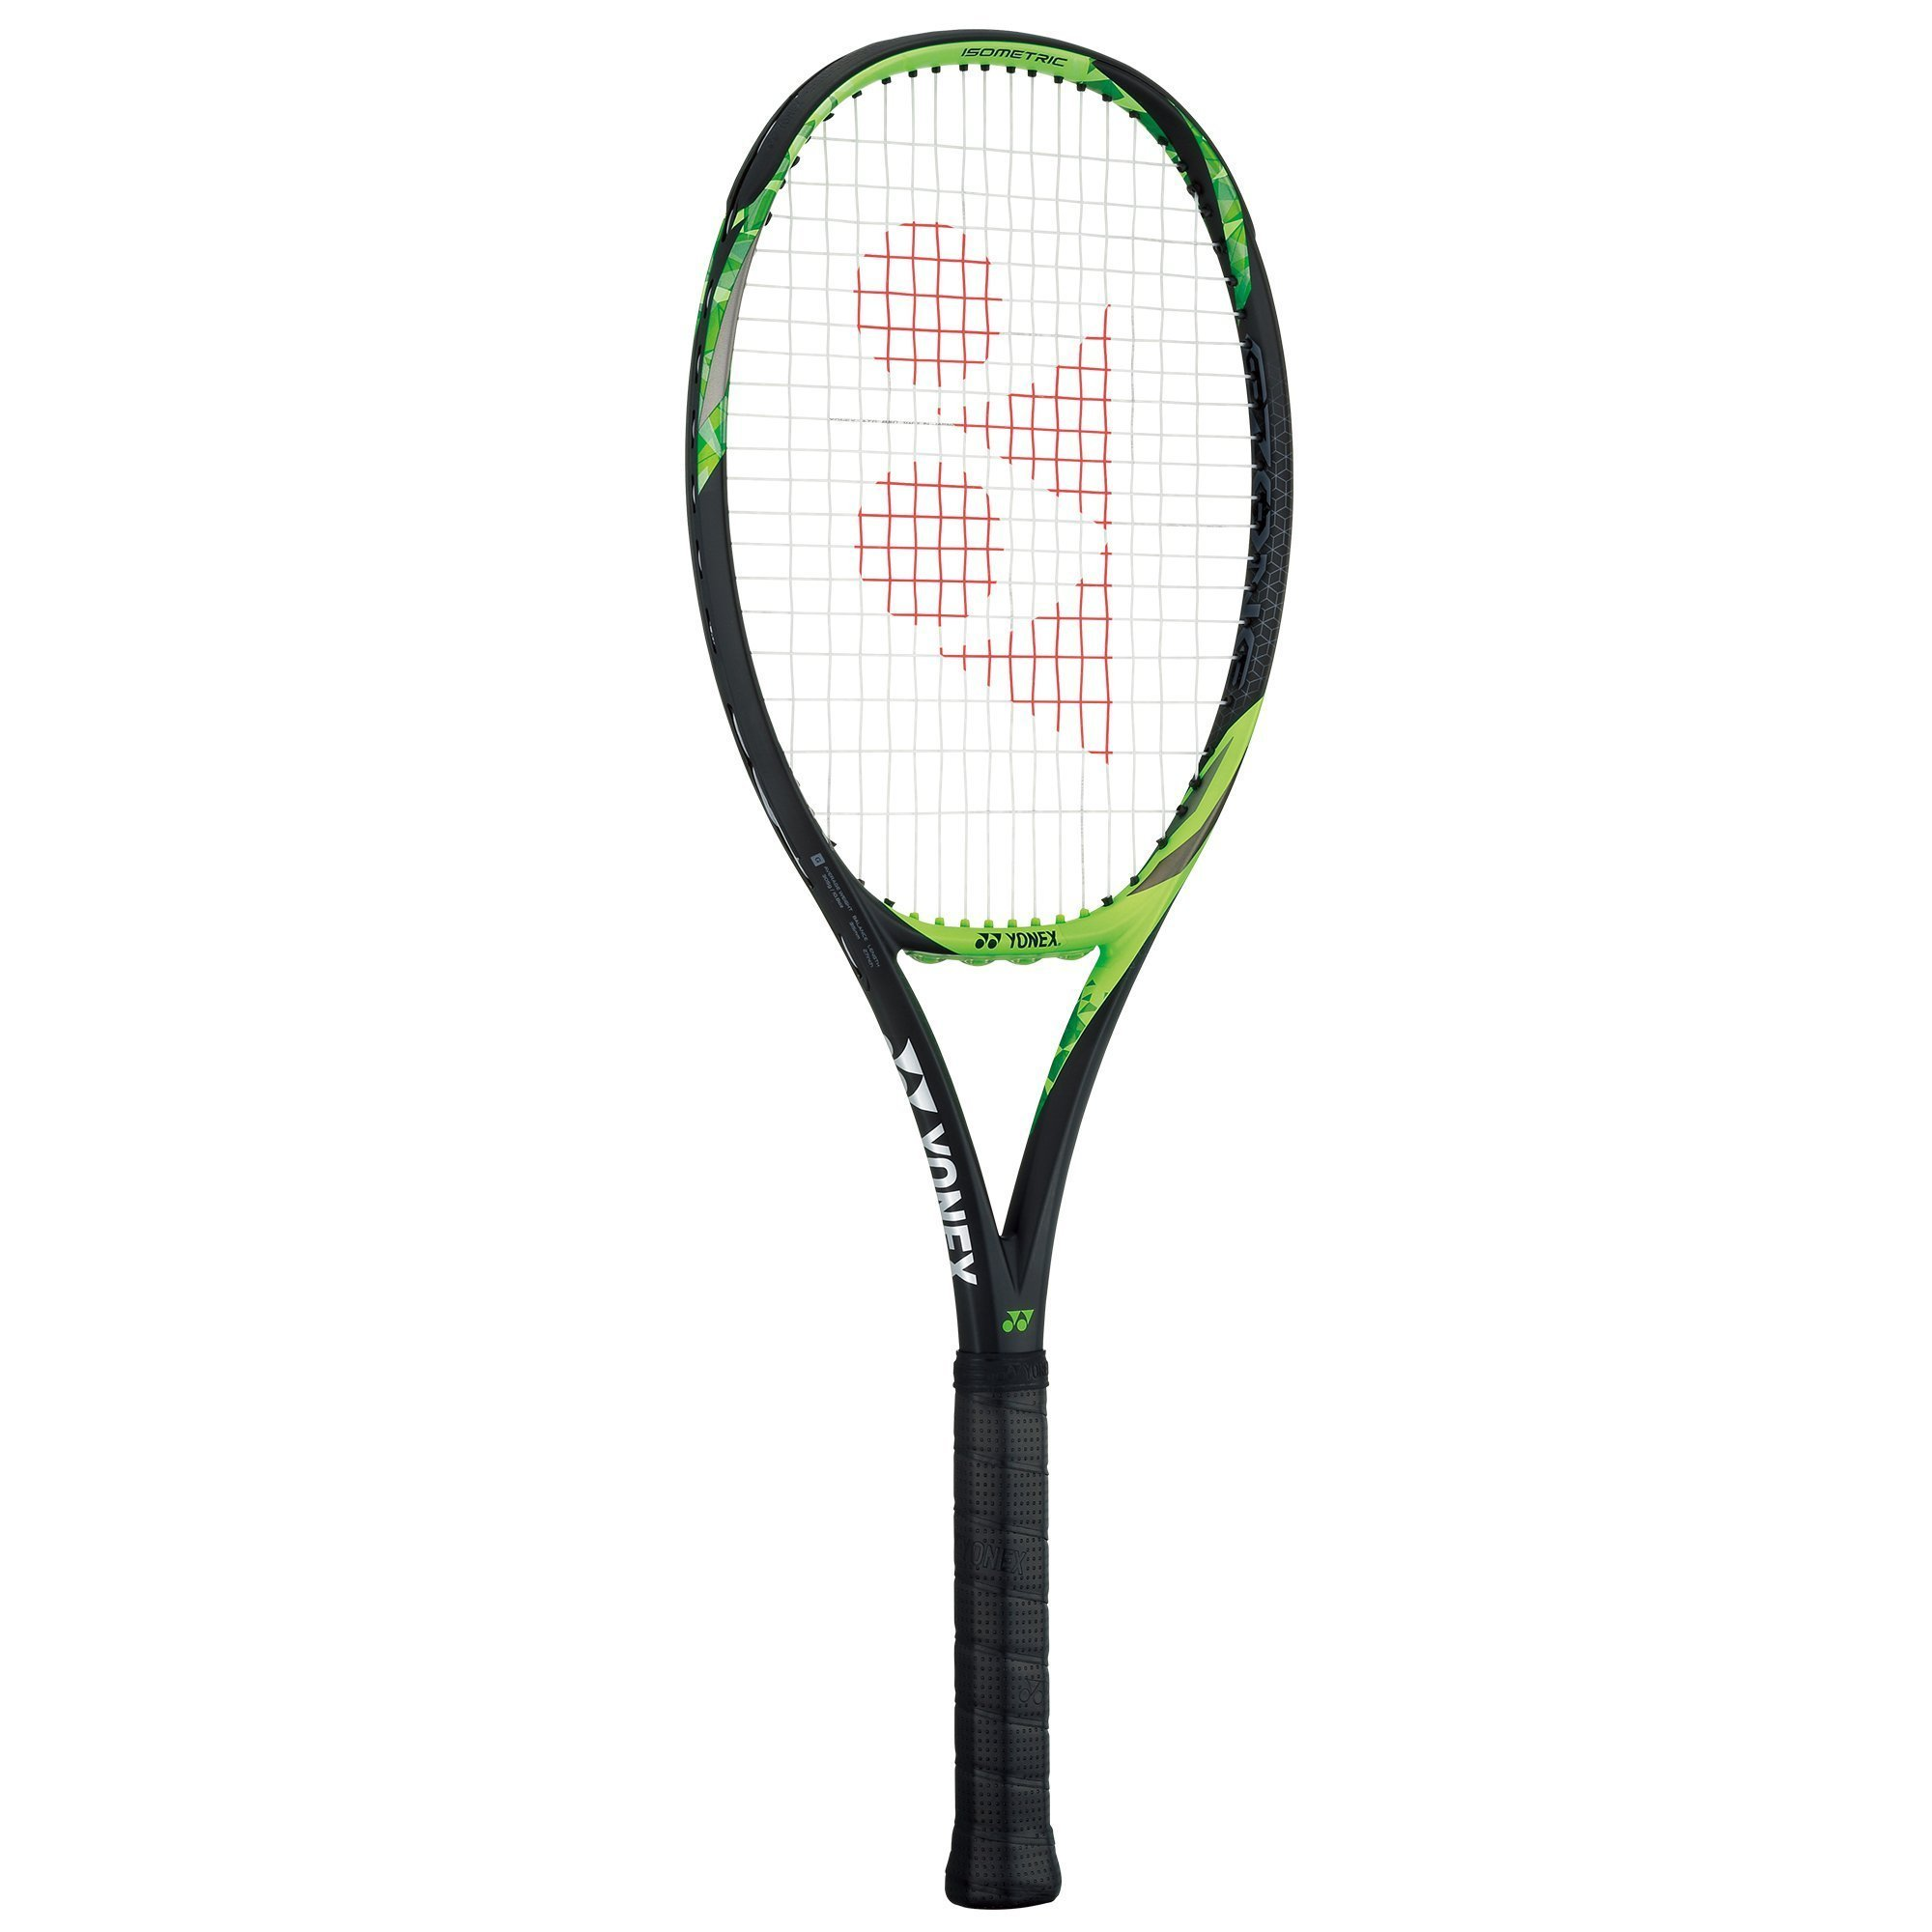 Yonex Tennis Racket – EZONE 98 (305g)